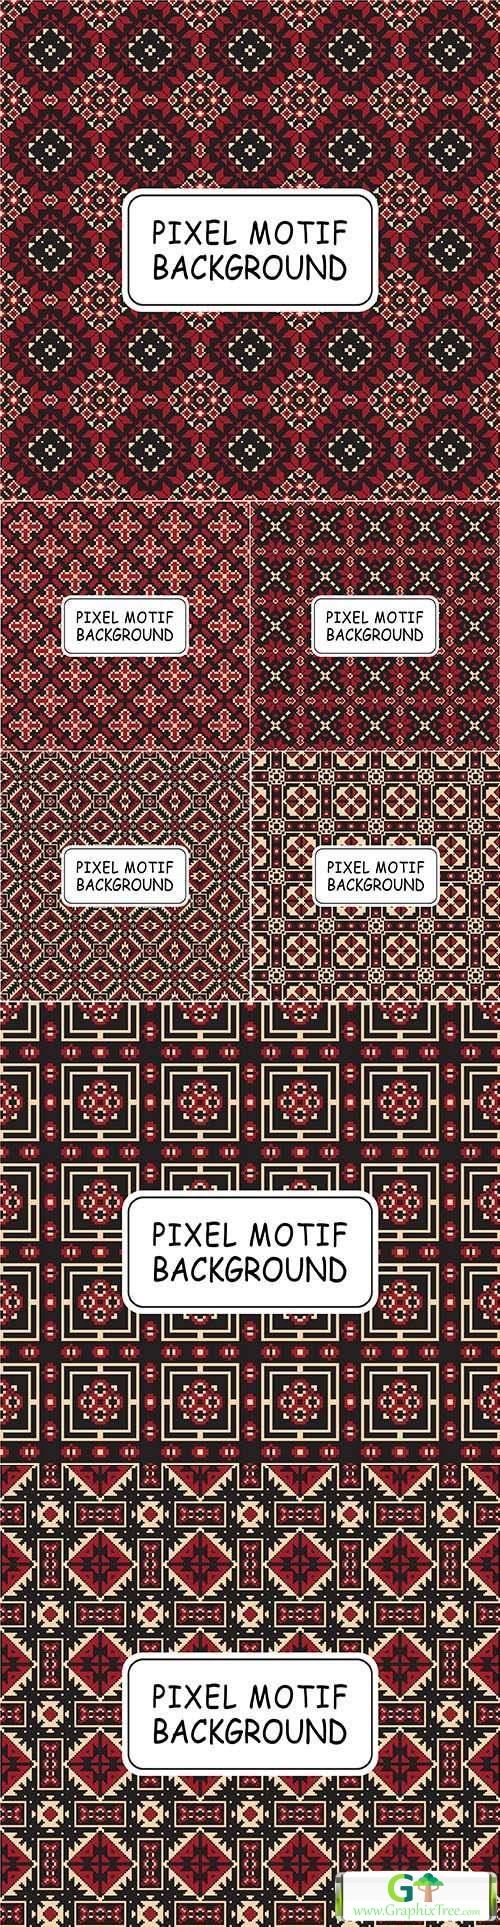 Pixel motif design decorative background